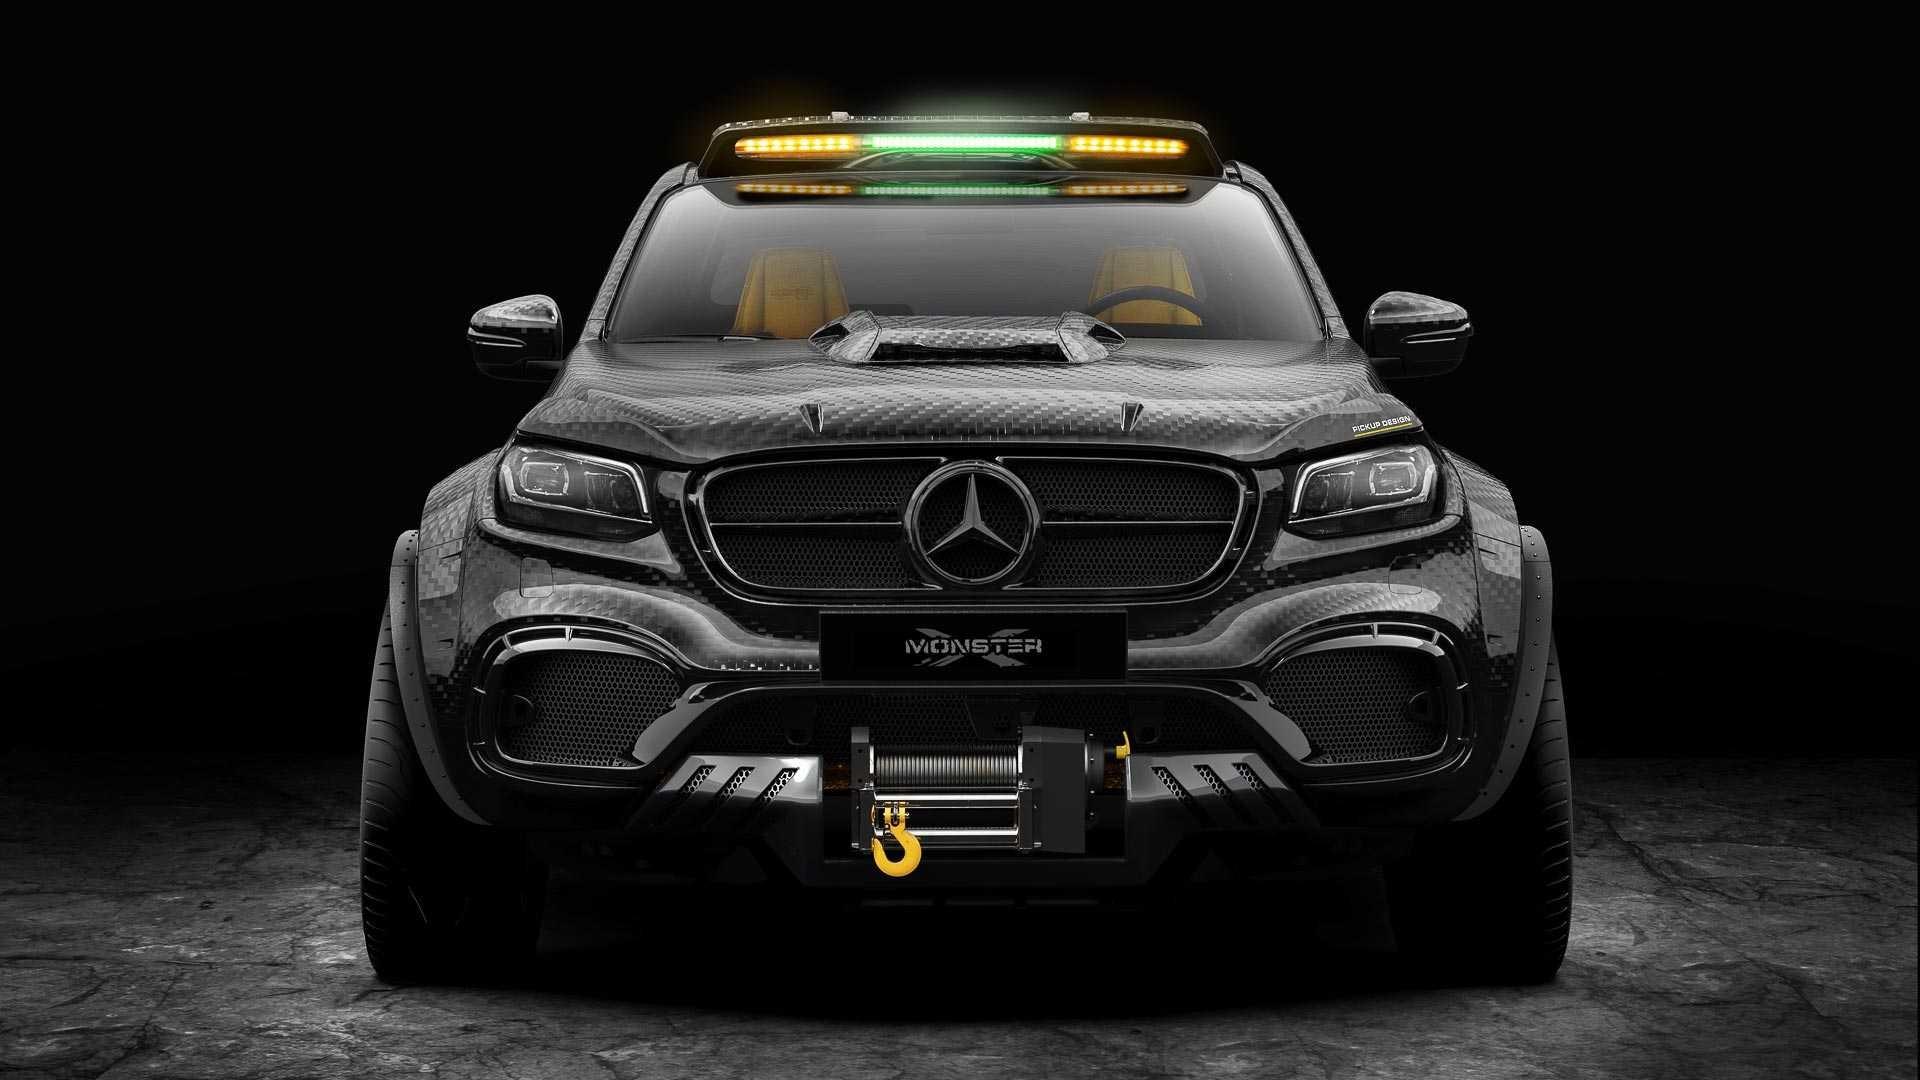 Foto de Mercedes-Benz Clase X Exy Monster X Concept (3/7)